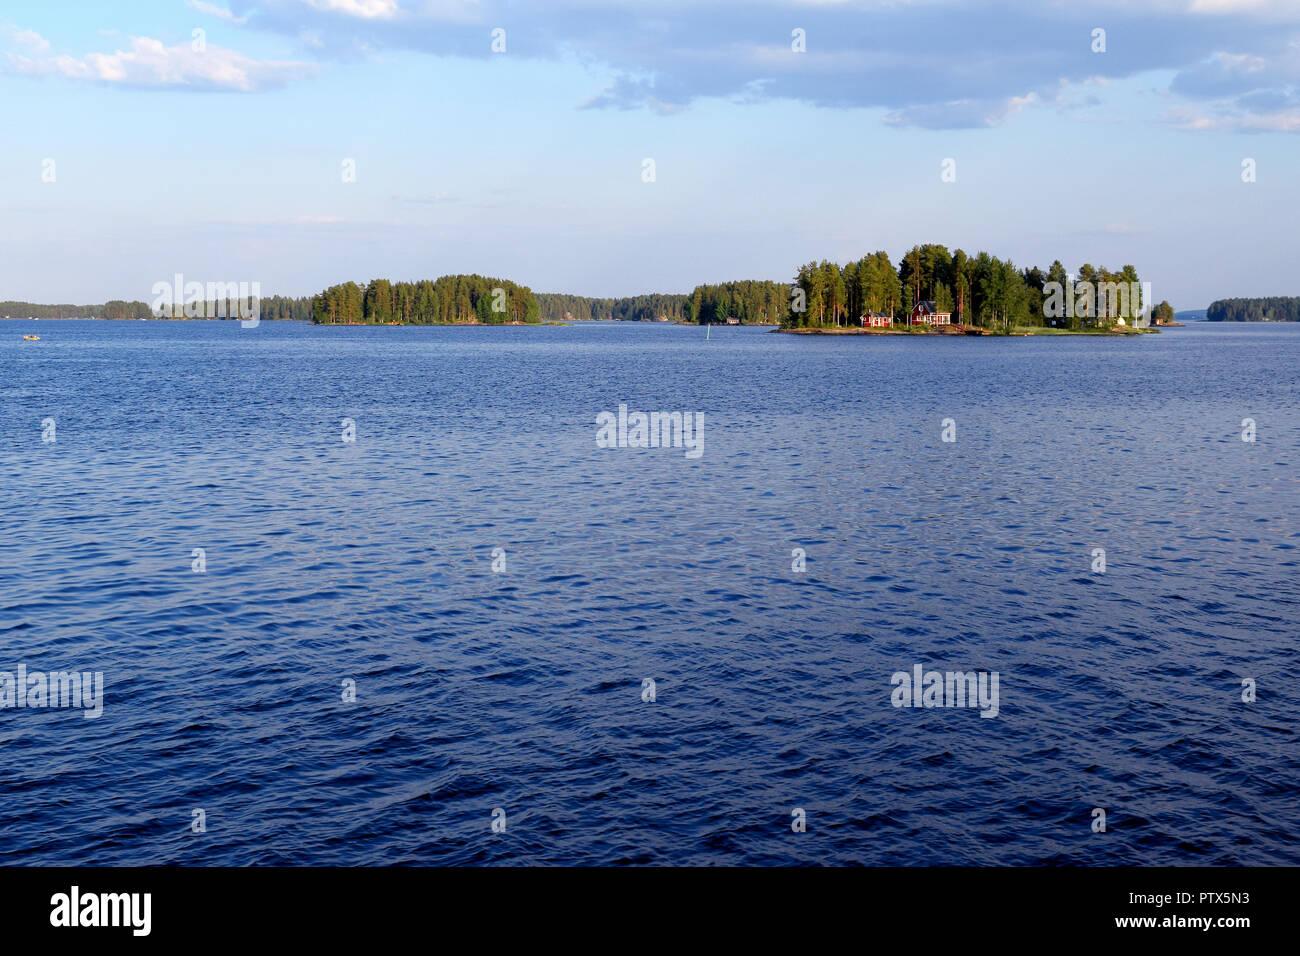 Lake Kallavesi near Kuopio, Finland - Stock Image